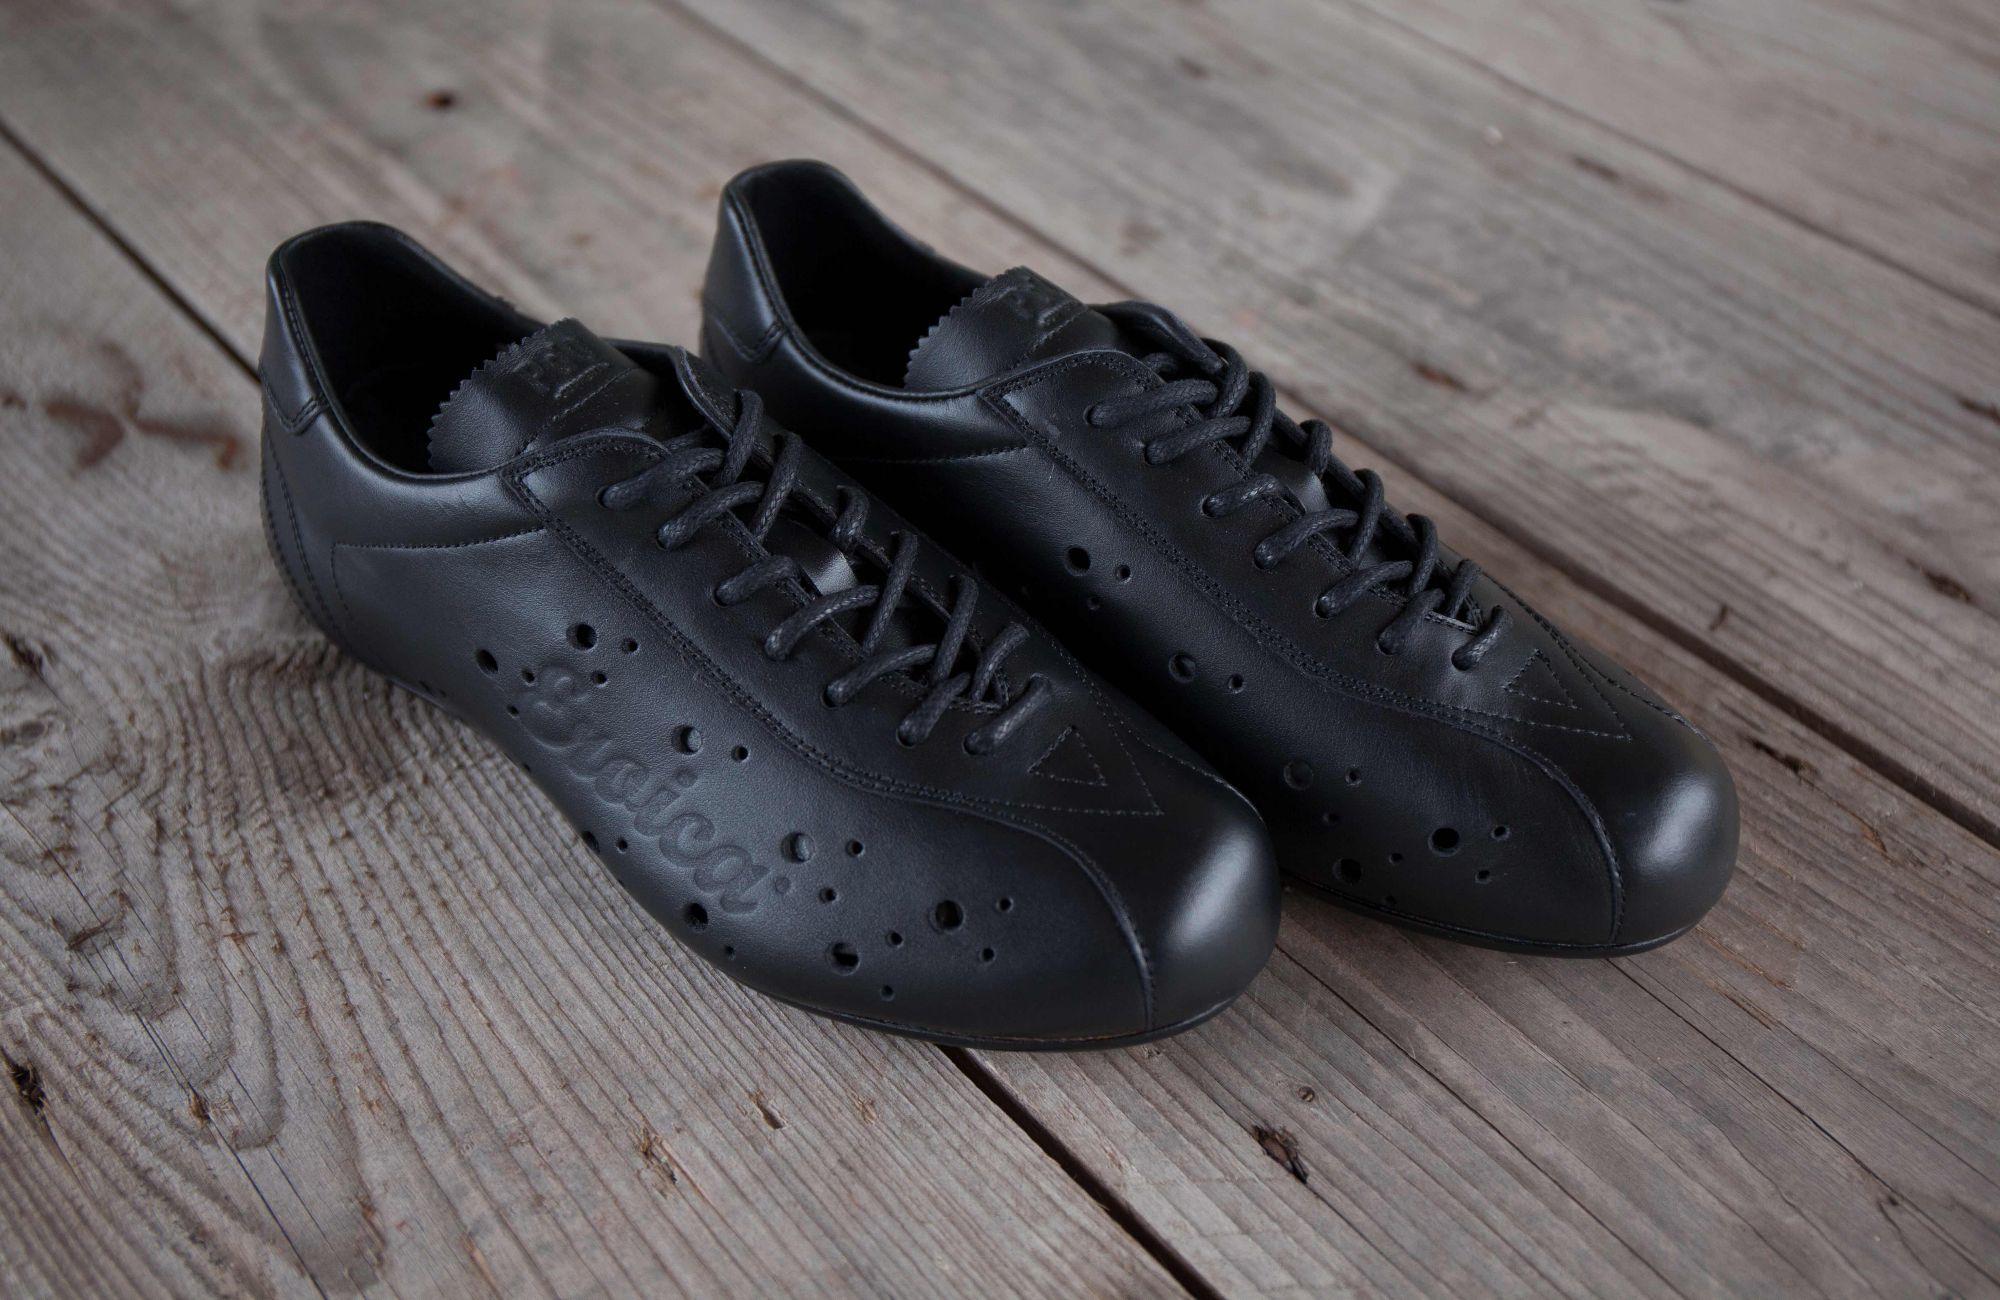 Pantofola d'Oro L'Eroica Scarpe Ciclismo Vuelta Pro